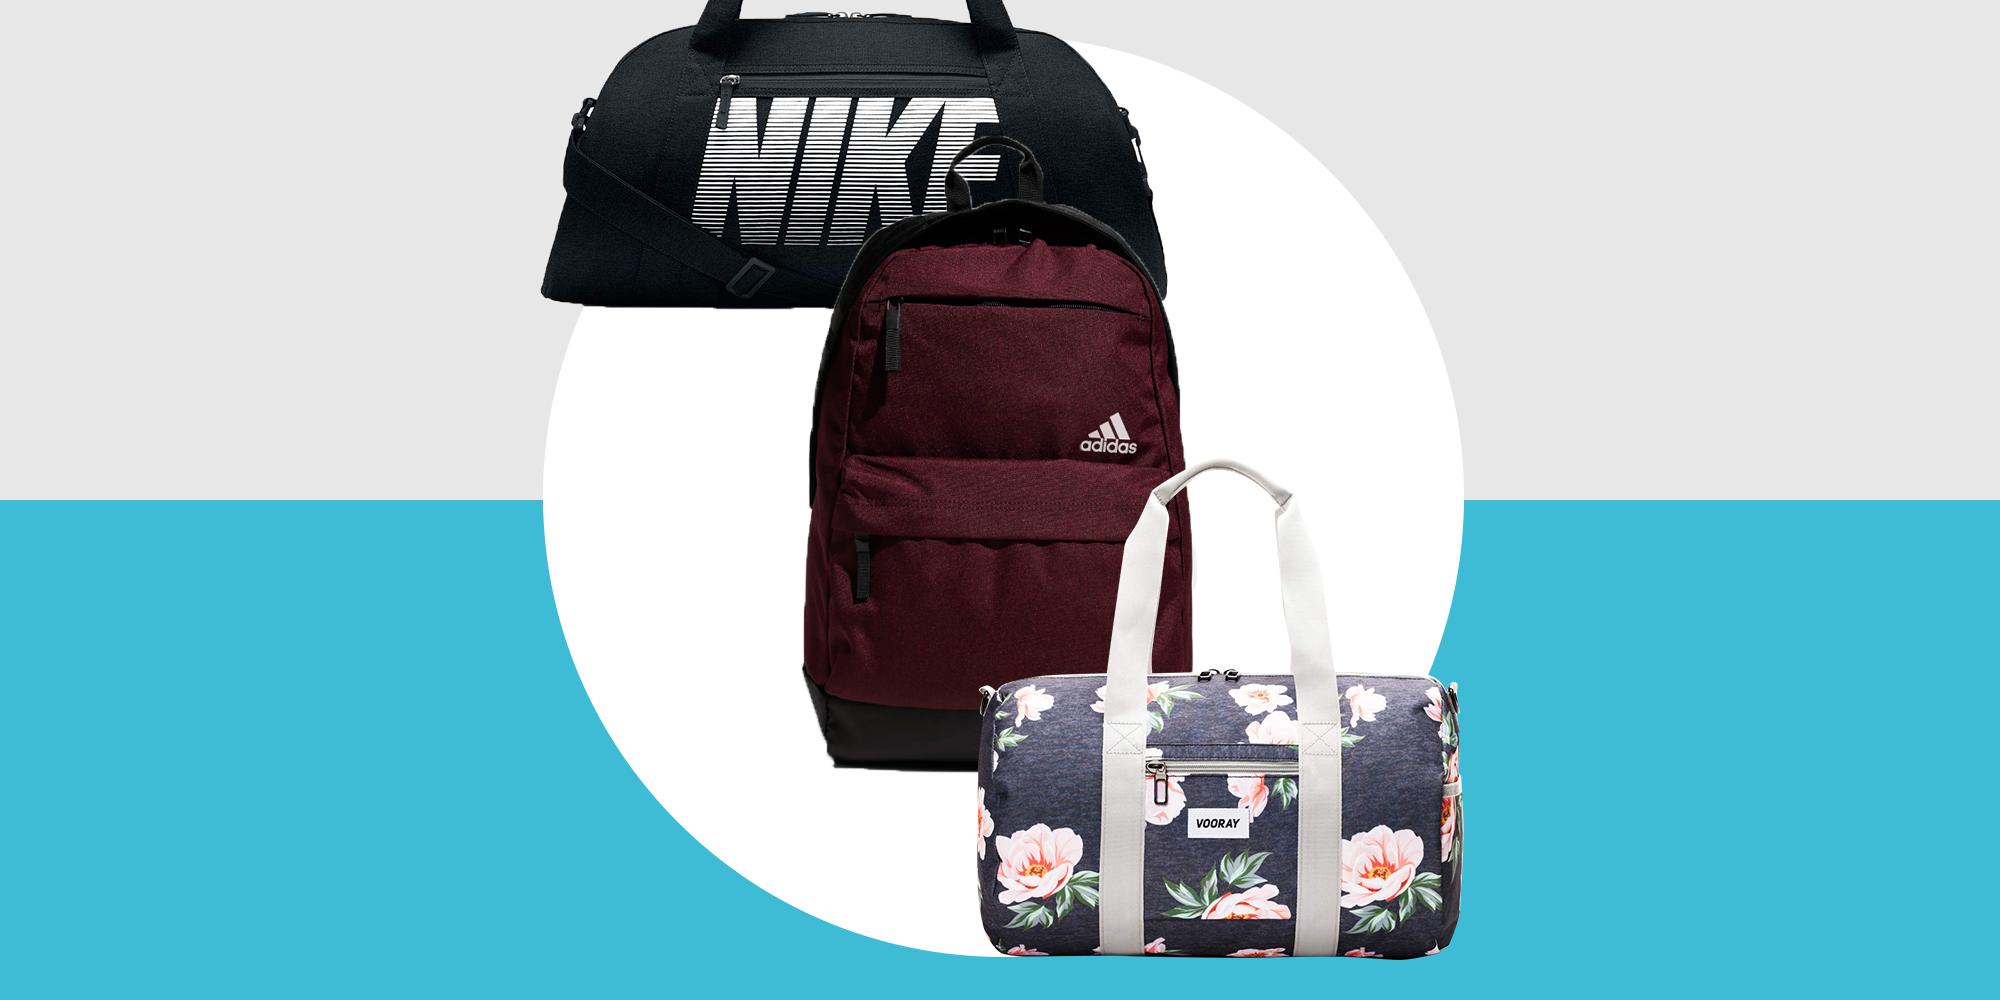 242501ff46 15 Best Gym Bags for Women 2019 - Top Gym Duffel Bags